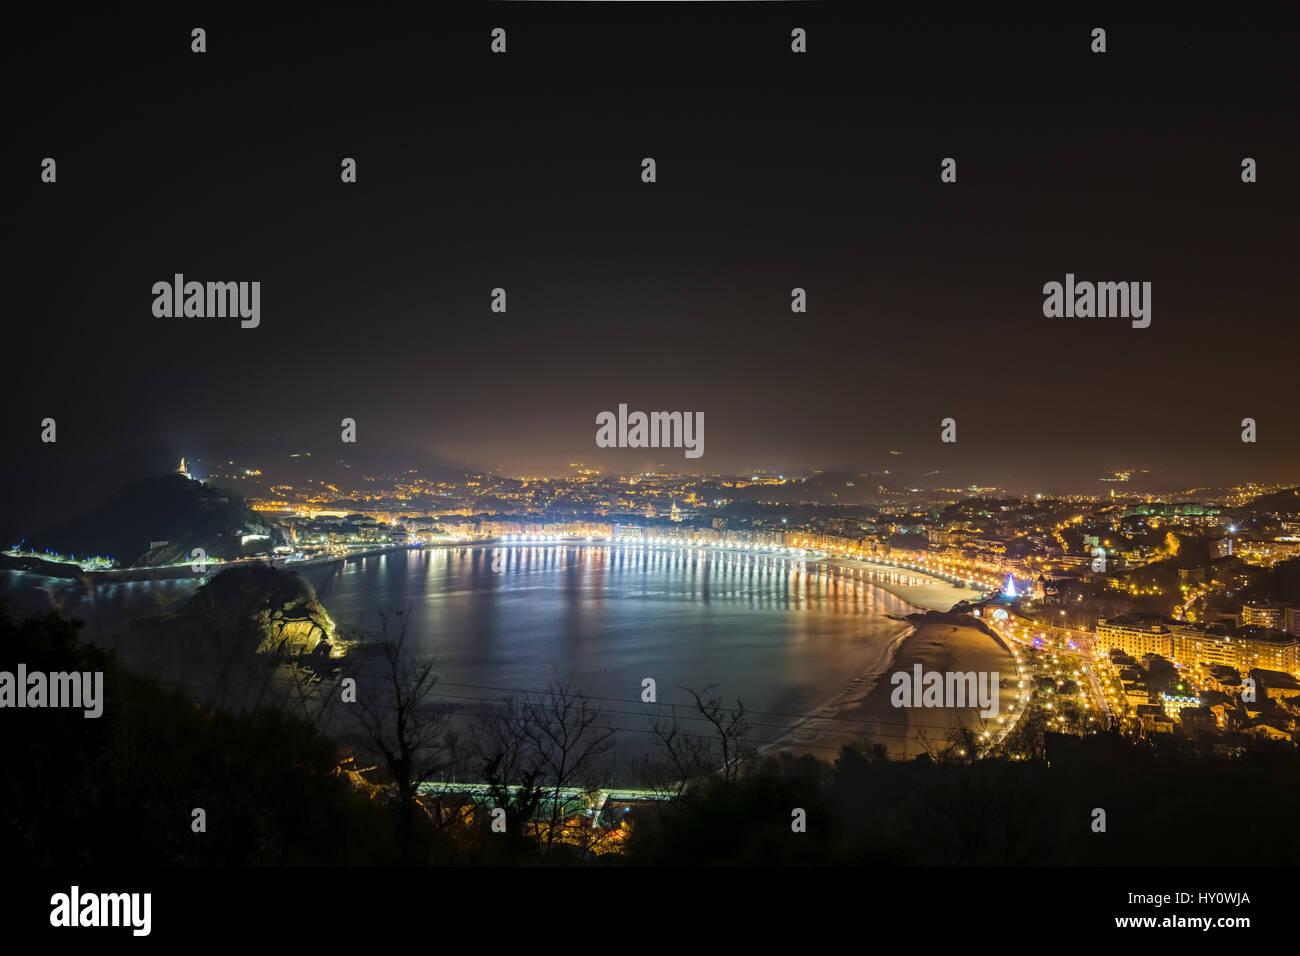 Donostia- San Sebastian at Night, Spain - Stock Image